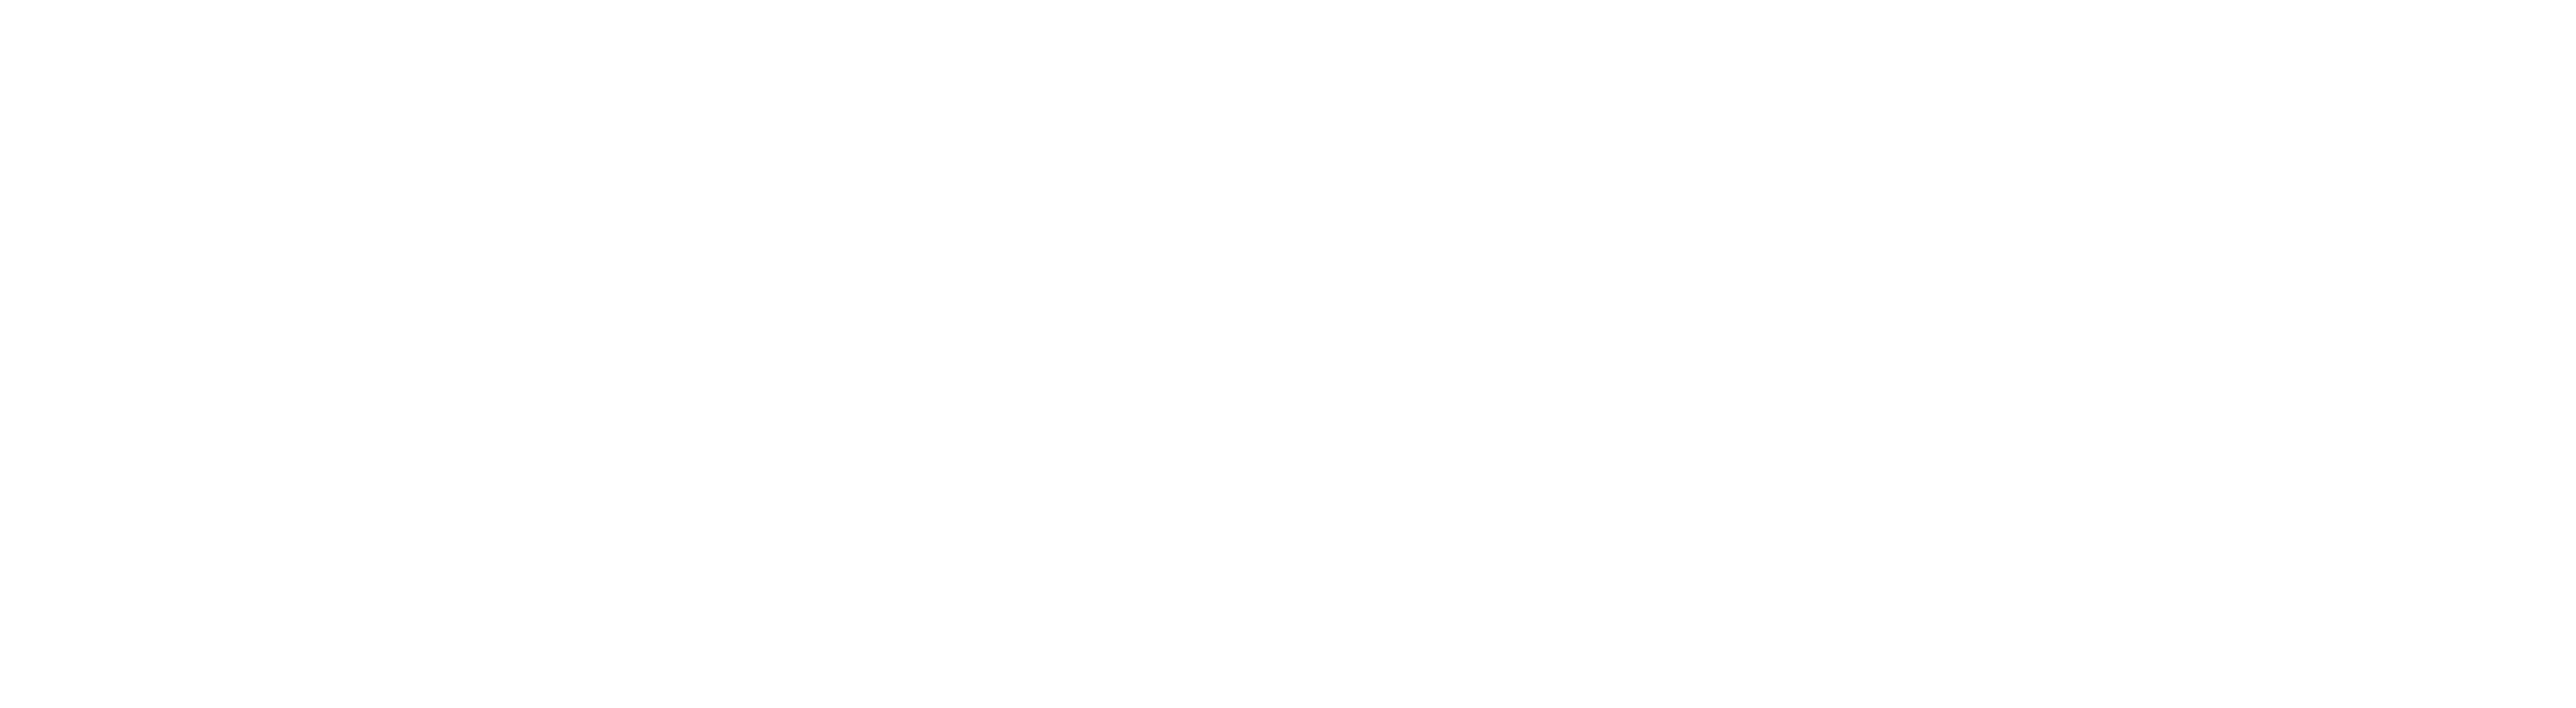 Monogram_Logotype AVM DE_RGB_Web_White